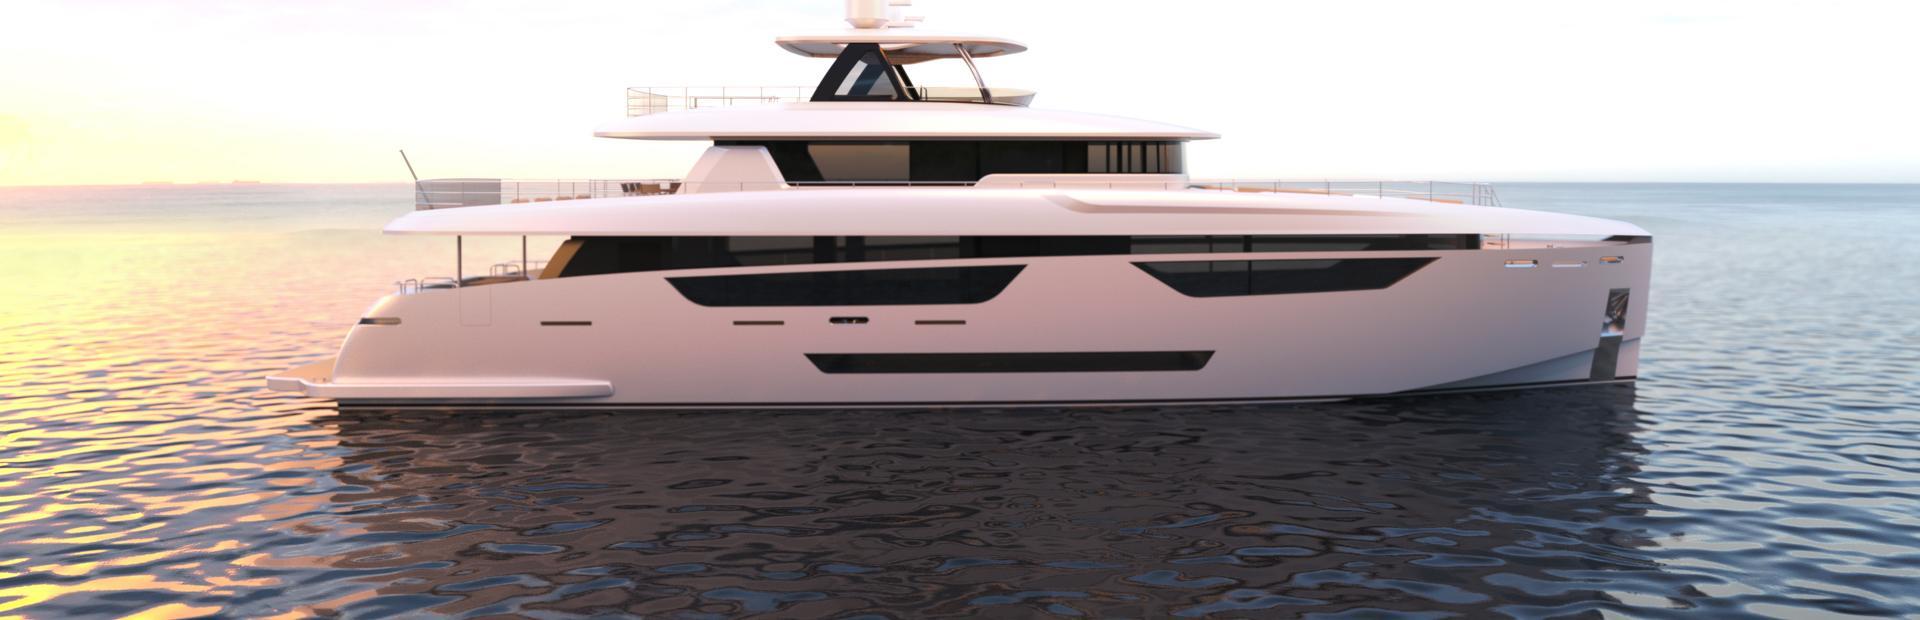 Johnson 115 Yacht Charter